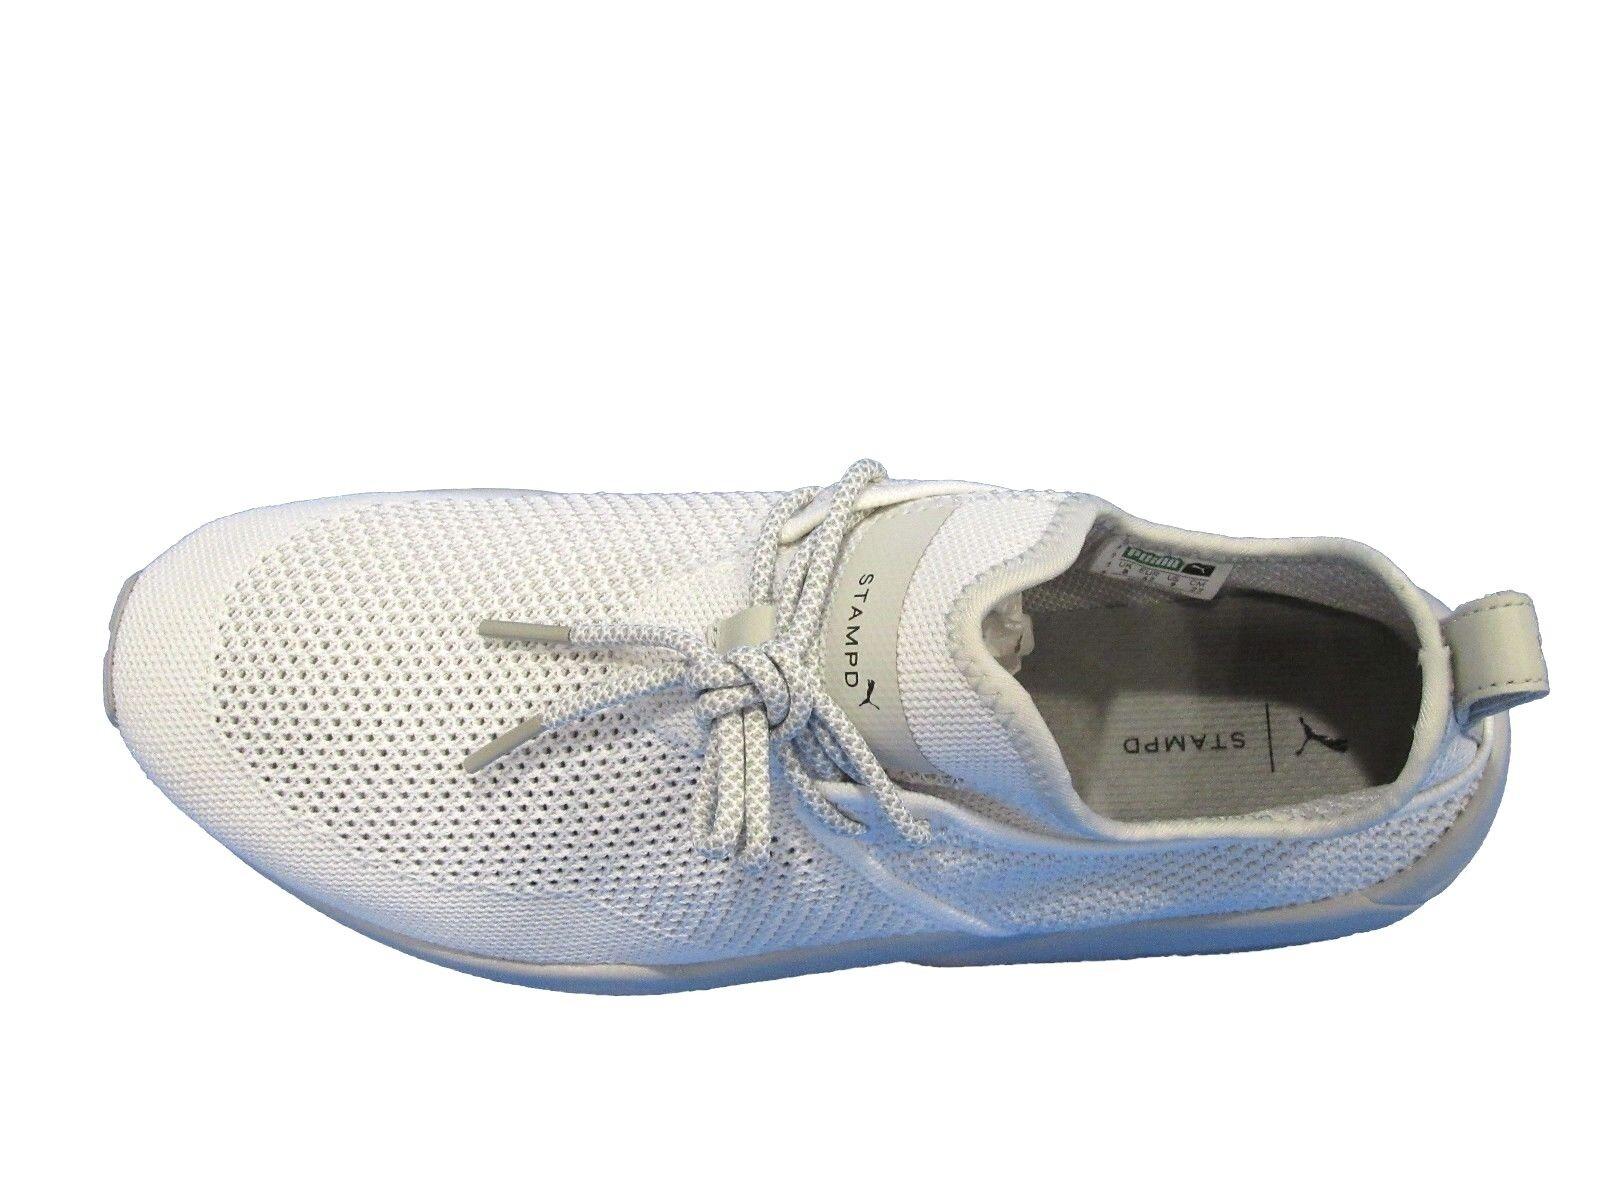 online store cc4ce a3b5e ... Puma X Stampd Stampd Stampd Trinomic Woven Mens Shoe High Rise 0e528c  ...